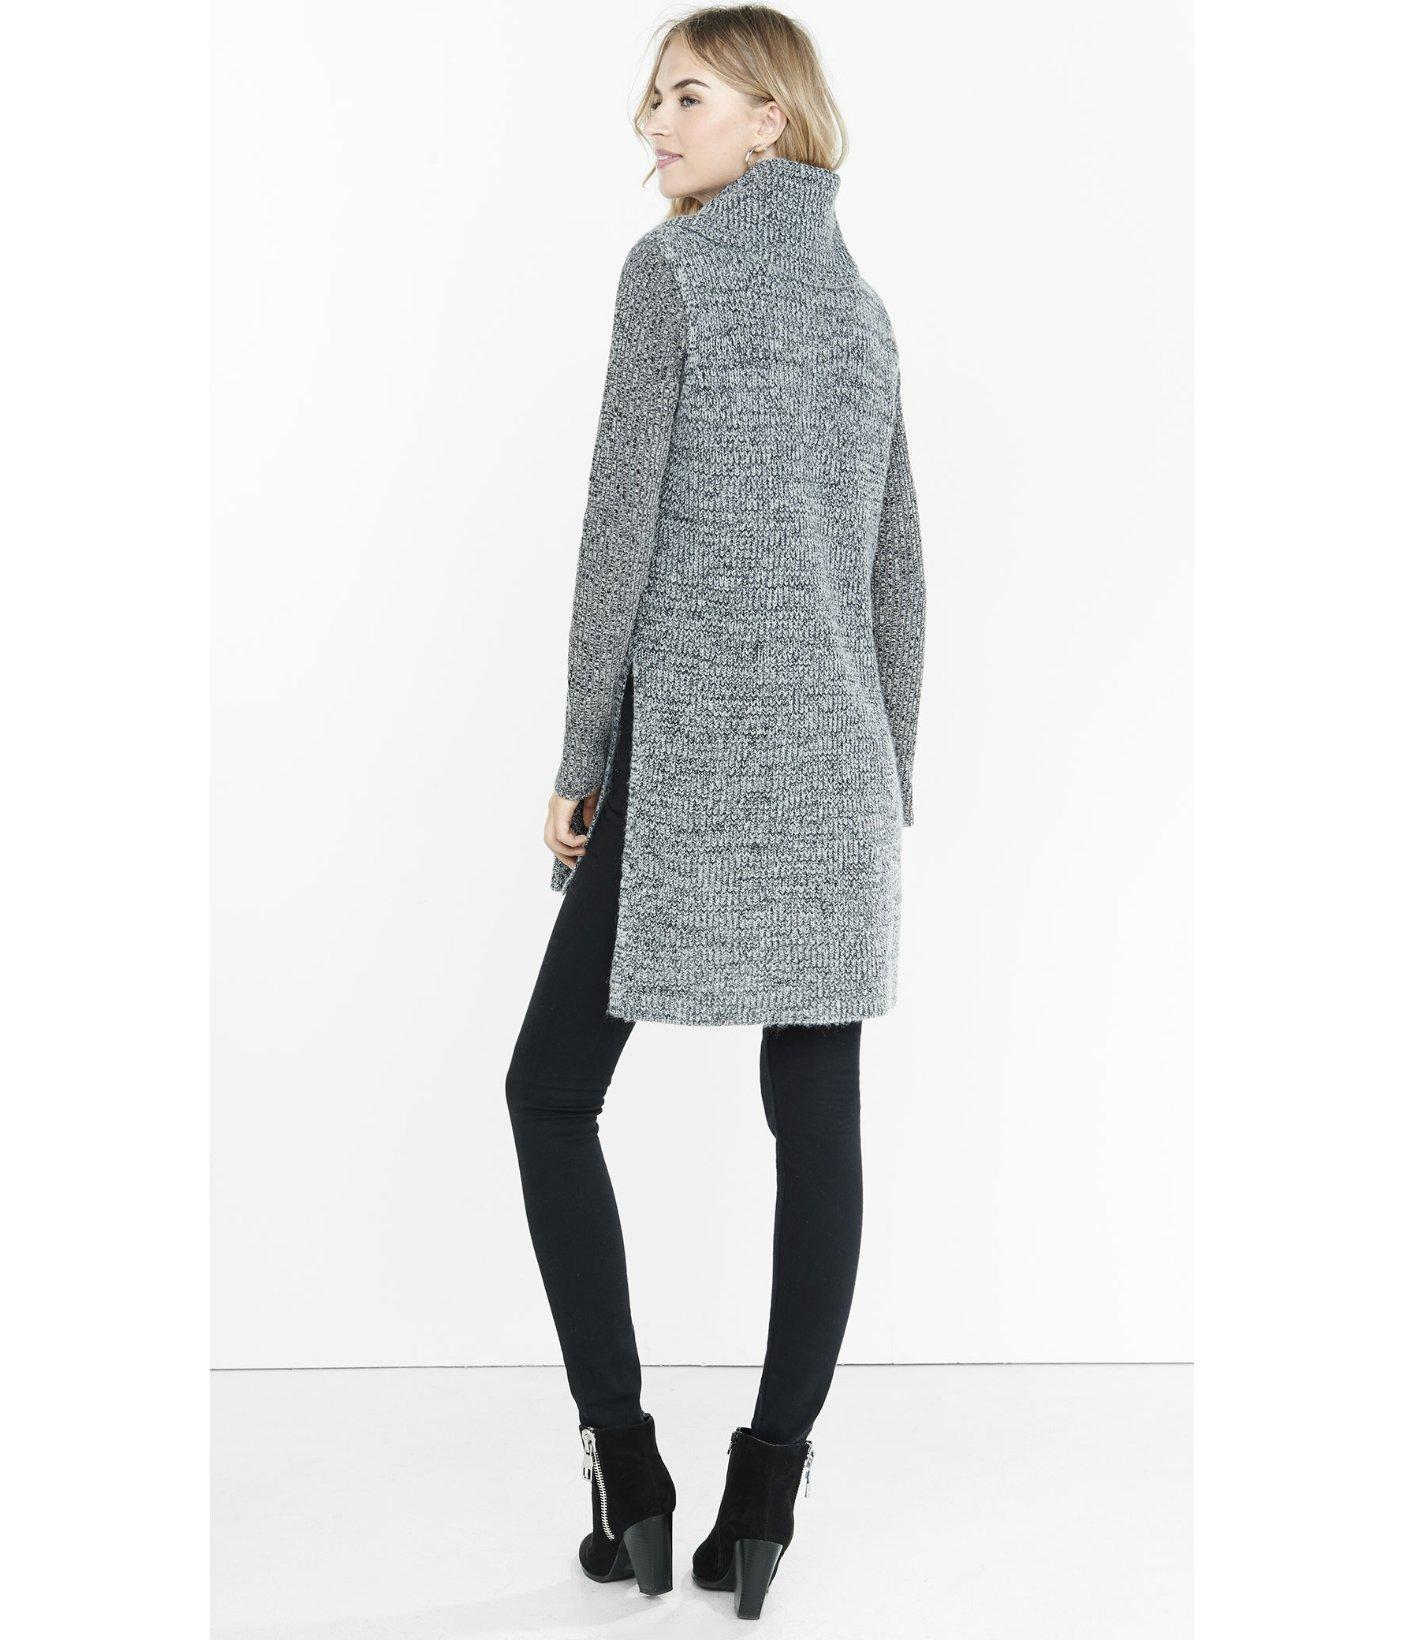 Express Marl Sleeveless Cowl Neck Tunic Sweater In Black